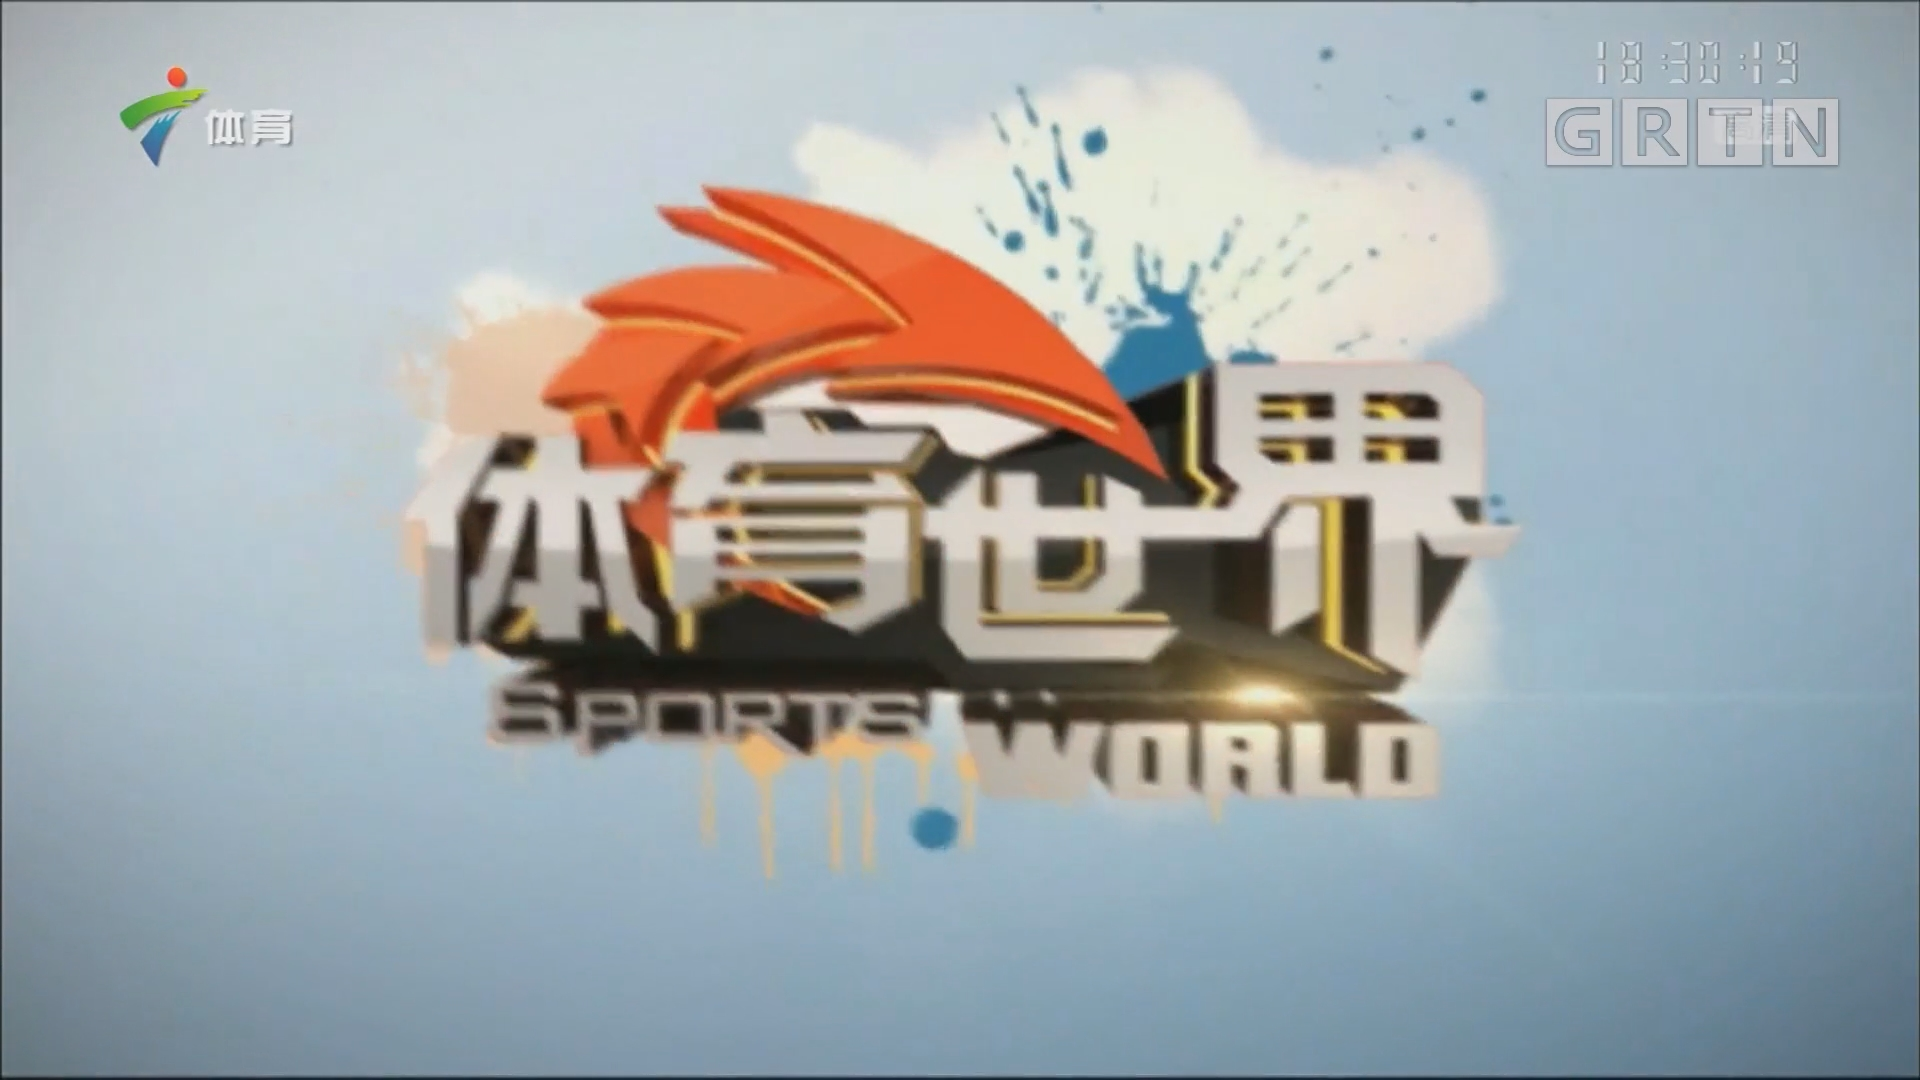 [HD][2018-05-12]体育世界:广东篮球联赛新启航